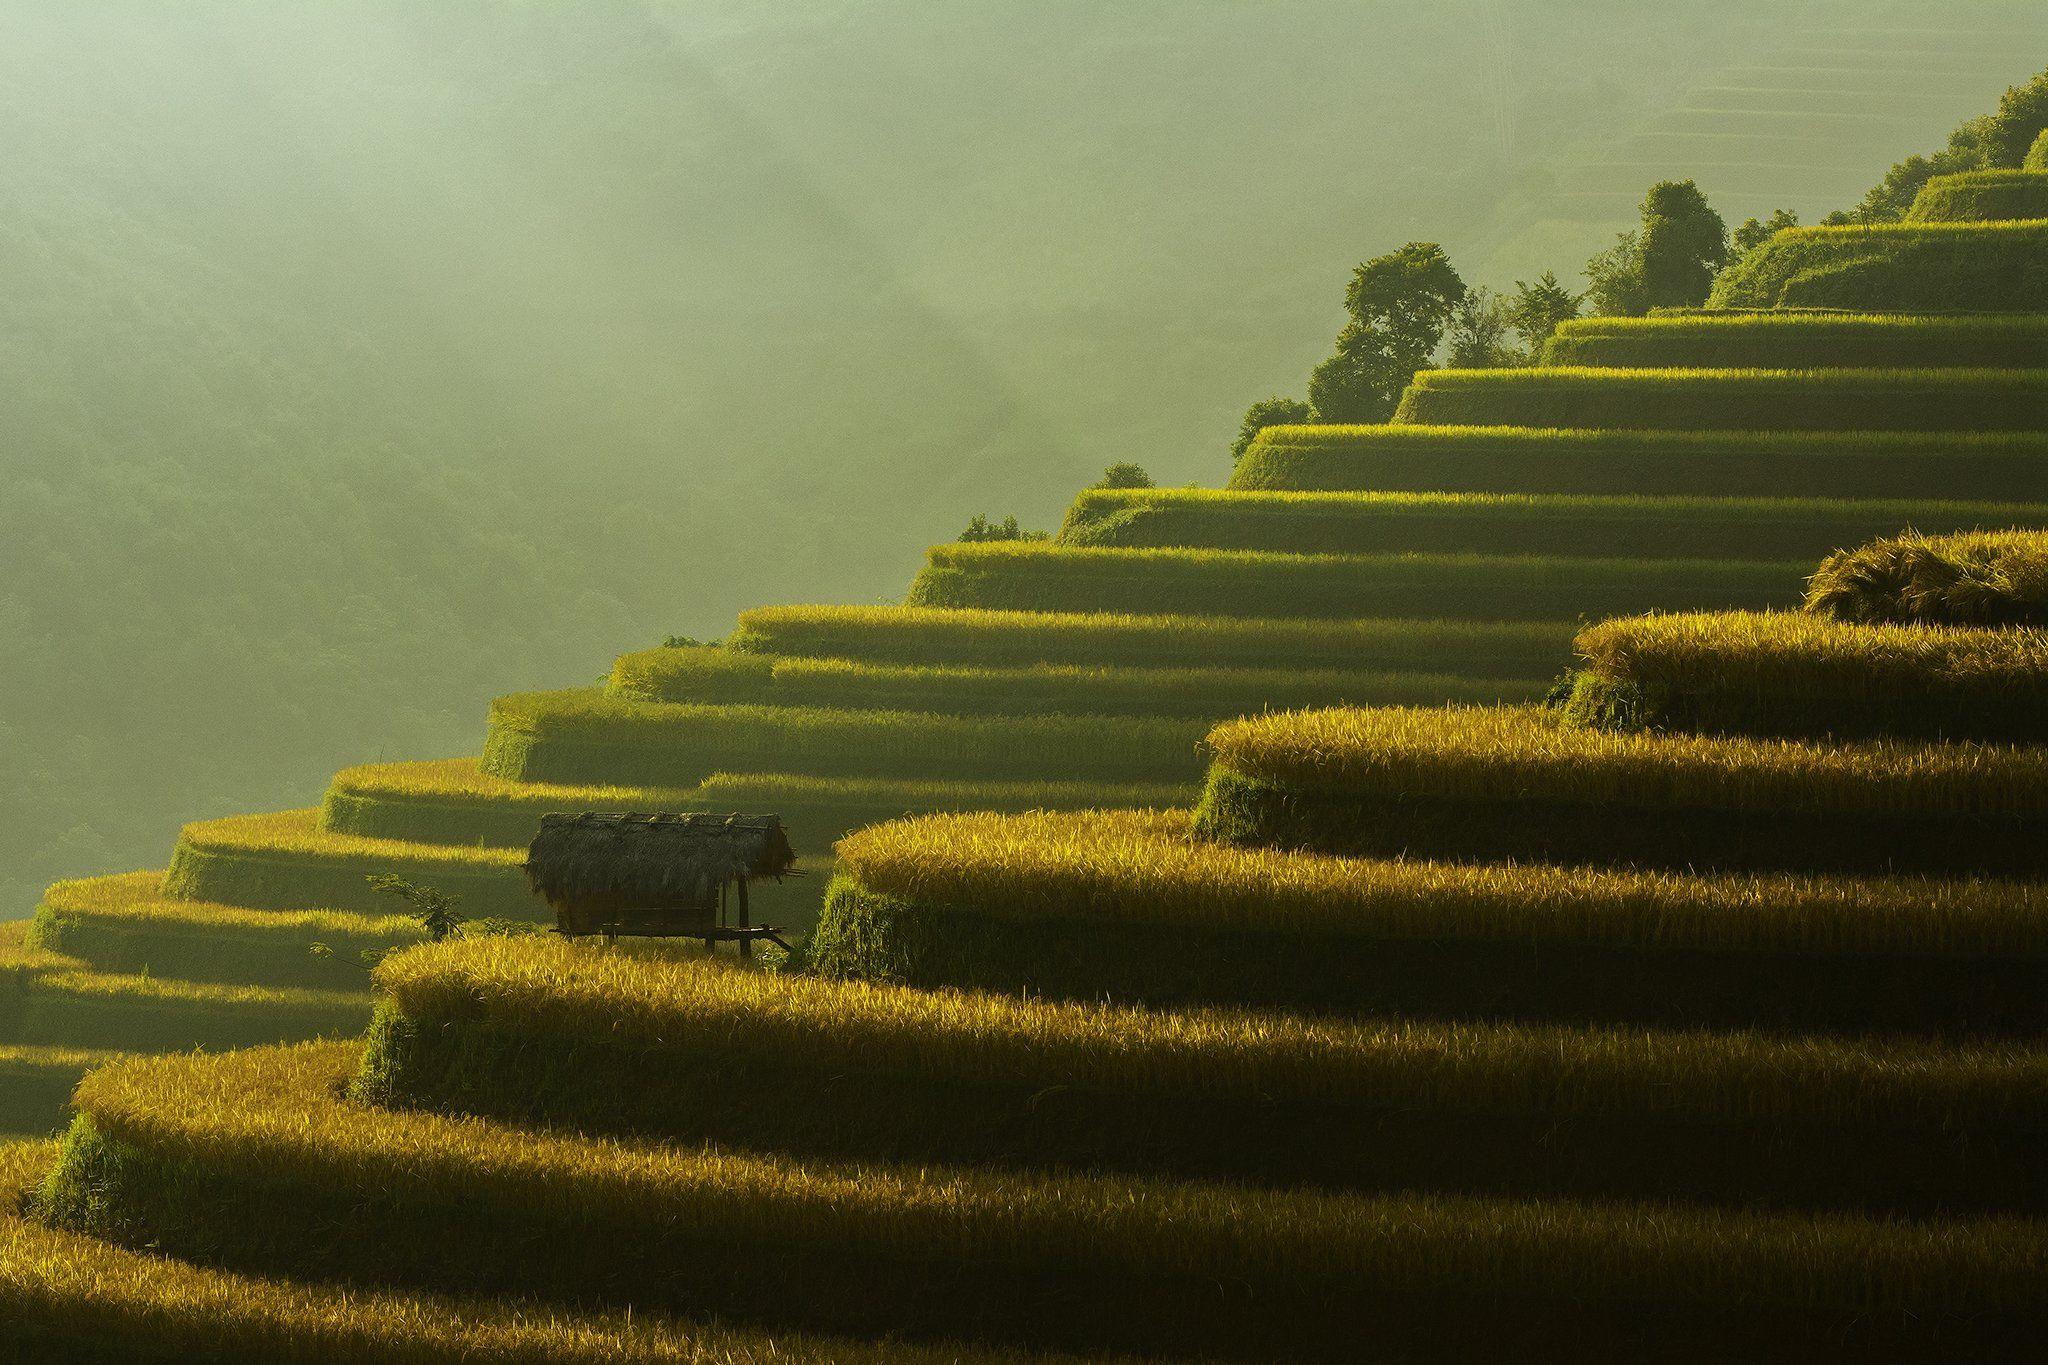 Asia, Asian, Beautiful, China, Culture, Field, Green, Landscape, Nikon, Photography, Plants, Rice, Terraces rice field, Thailand, Vietnam, Yellow, Saravut Whanset